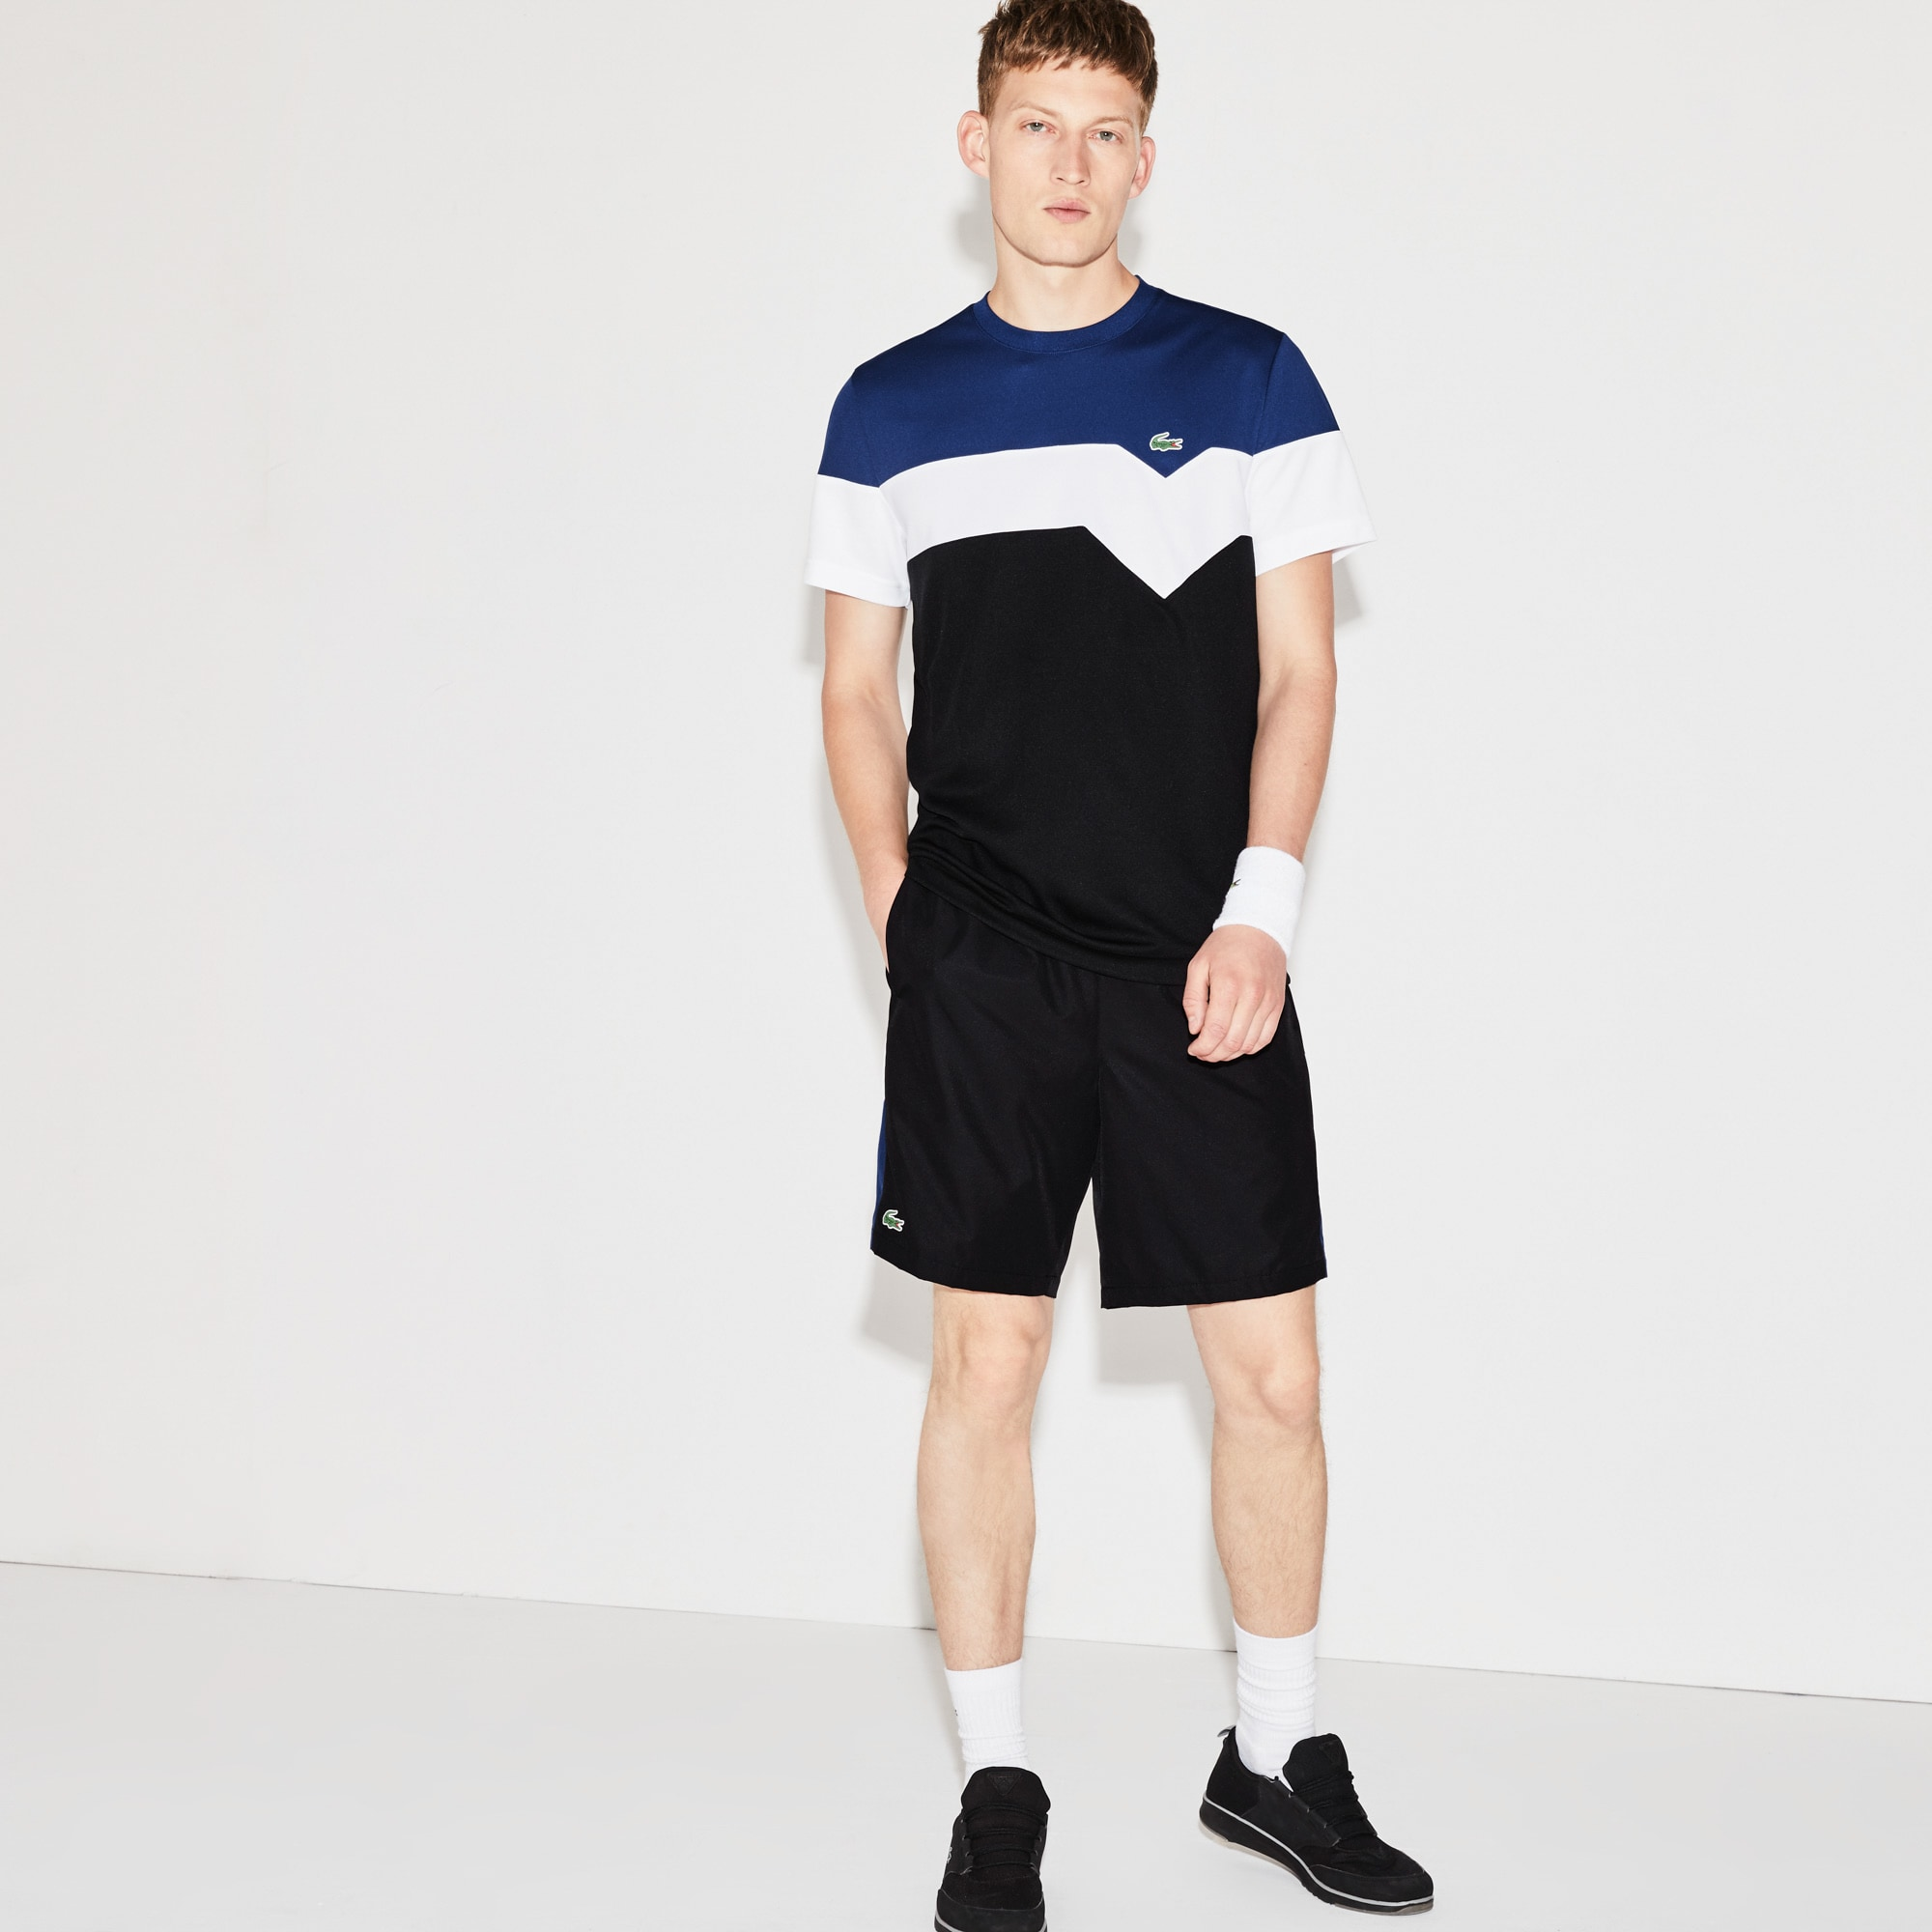 polo shirts shoes leather goods lacoste online boutique. Black Bedroom Furniture Sets. Home Design Ideas